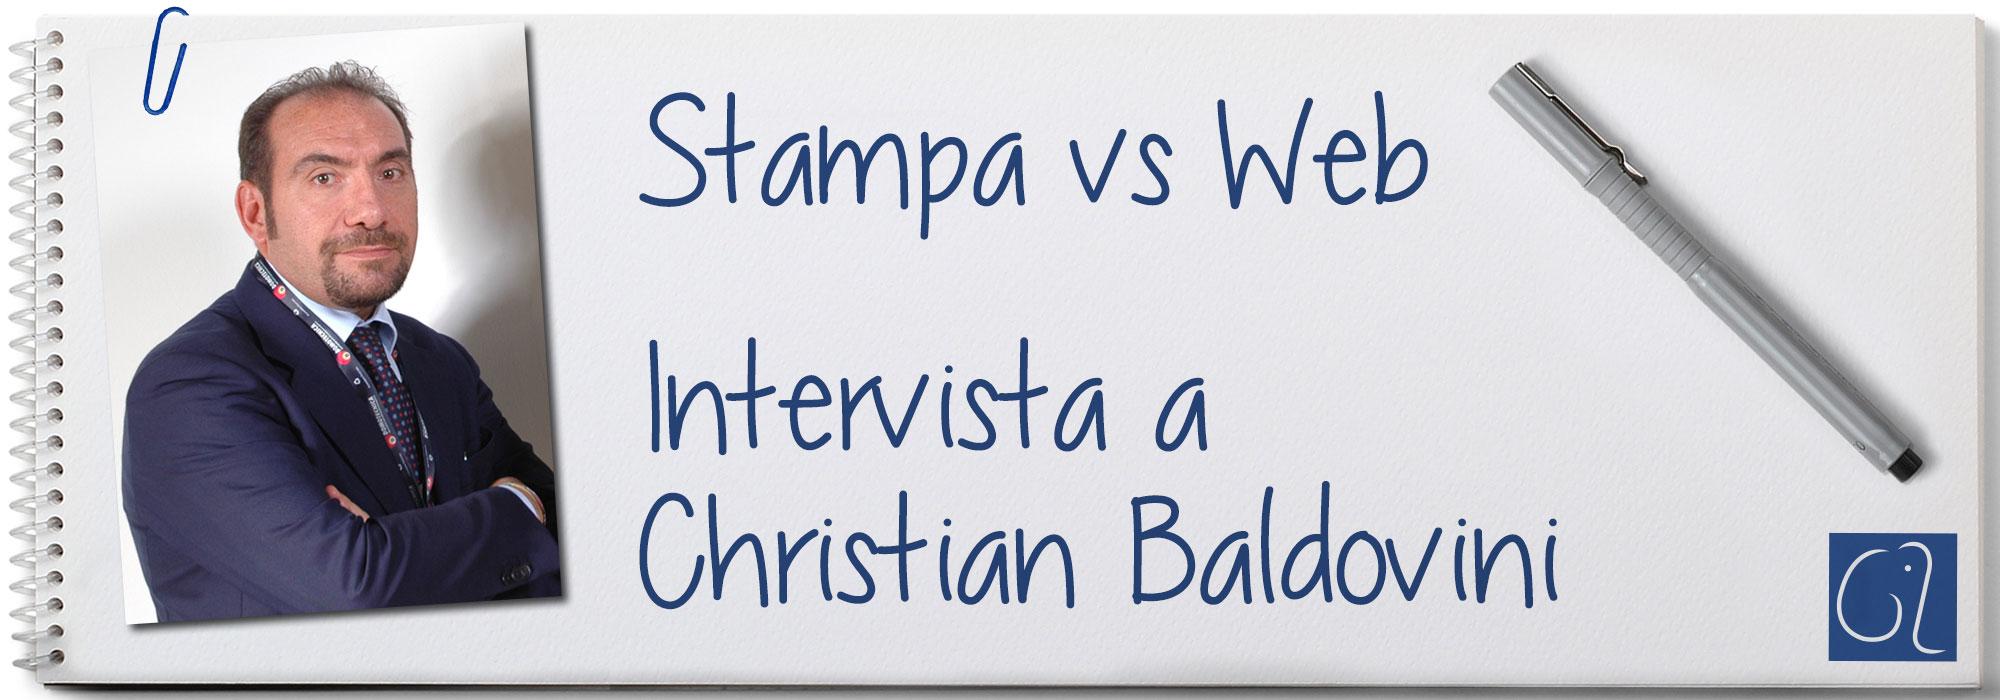 Stampa vs Web - Intervista a Christian Baldovini